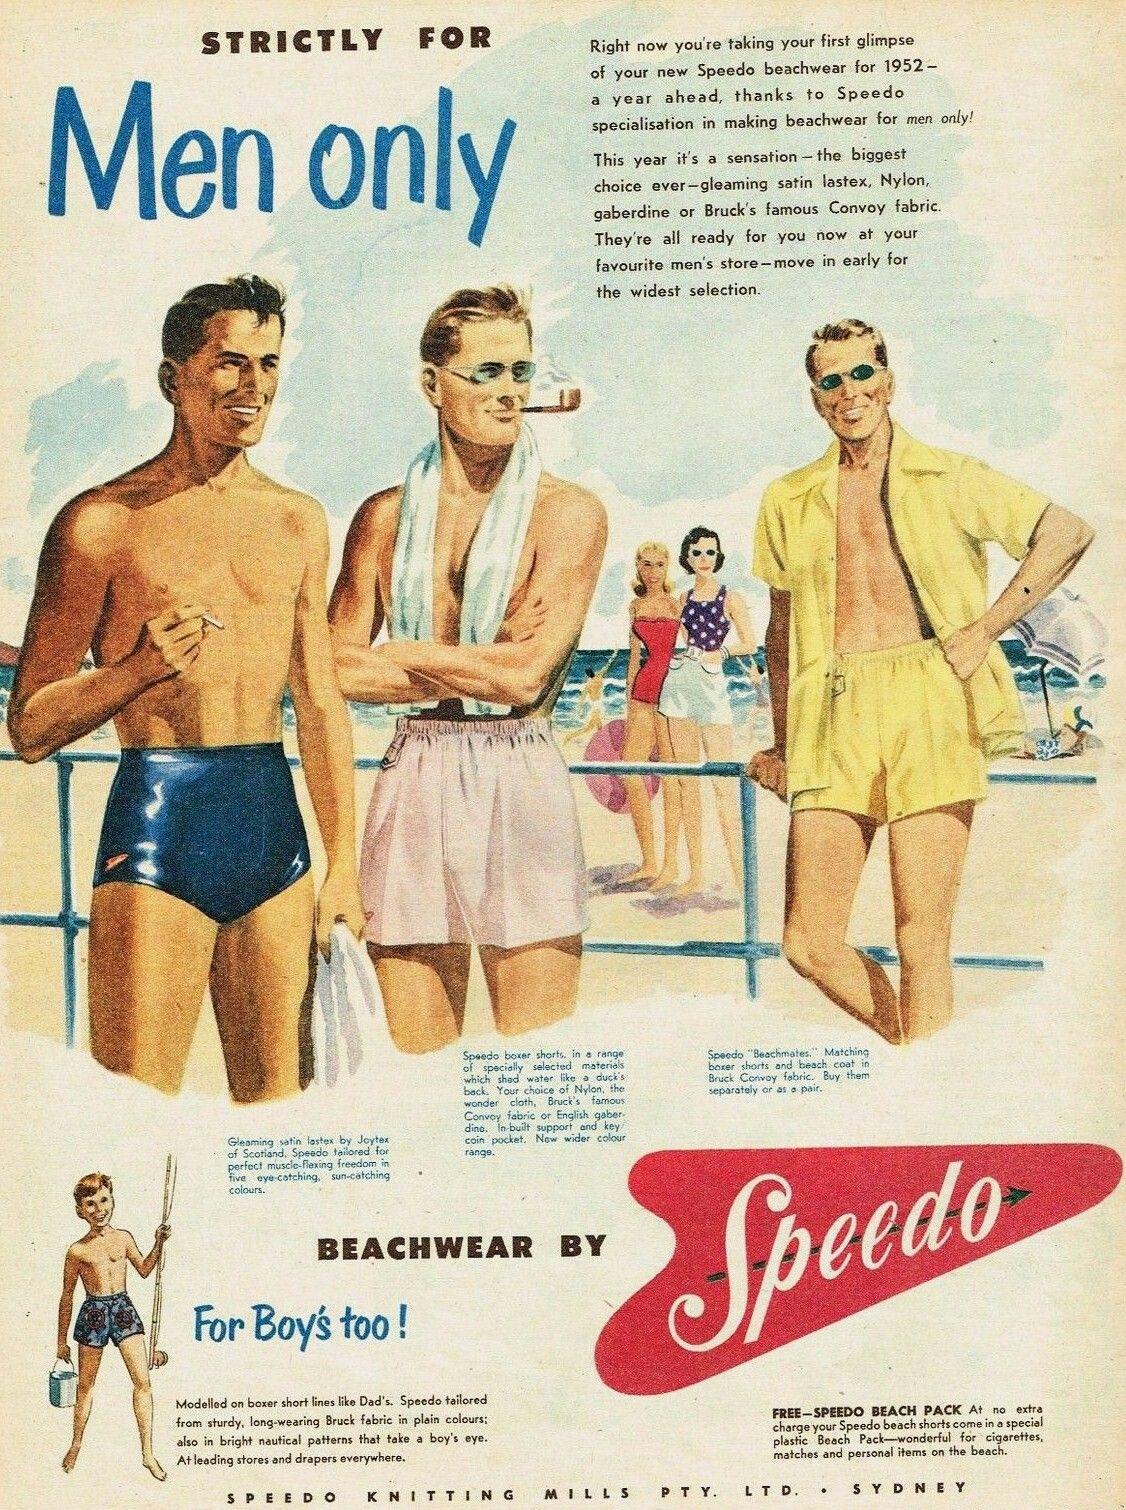 3f66a82eeb4dc Speedo 1951 1950s Ads, Vintage Swimsuits, Vintage Bikini, Australian  Fashion, Australian Vintage